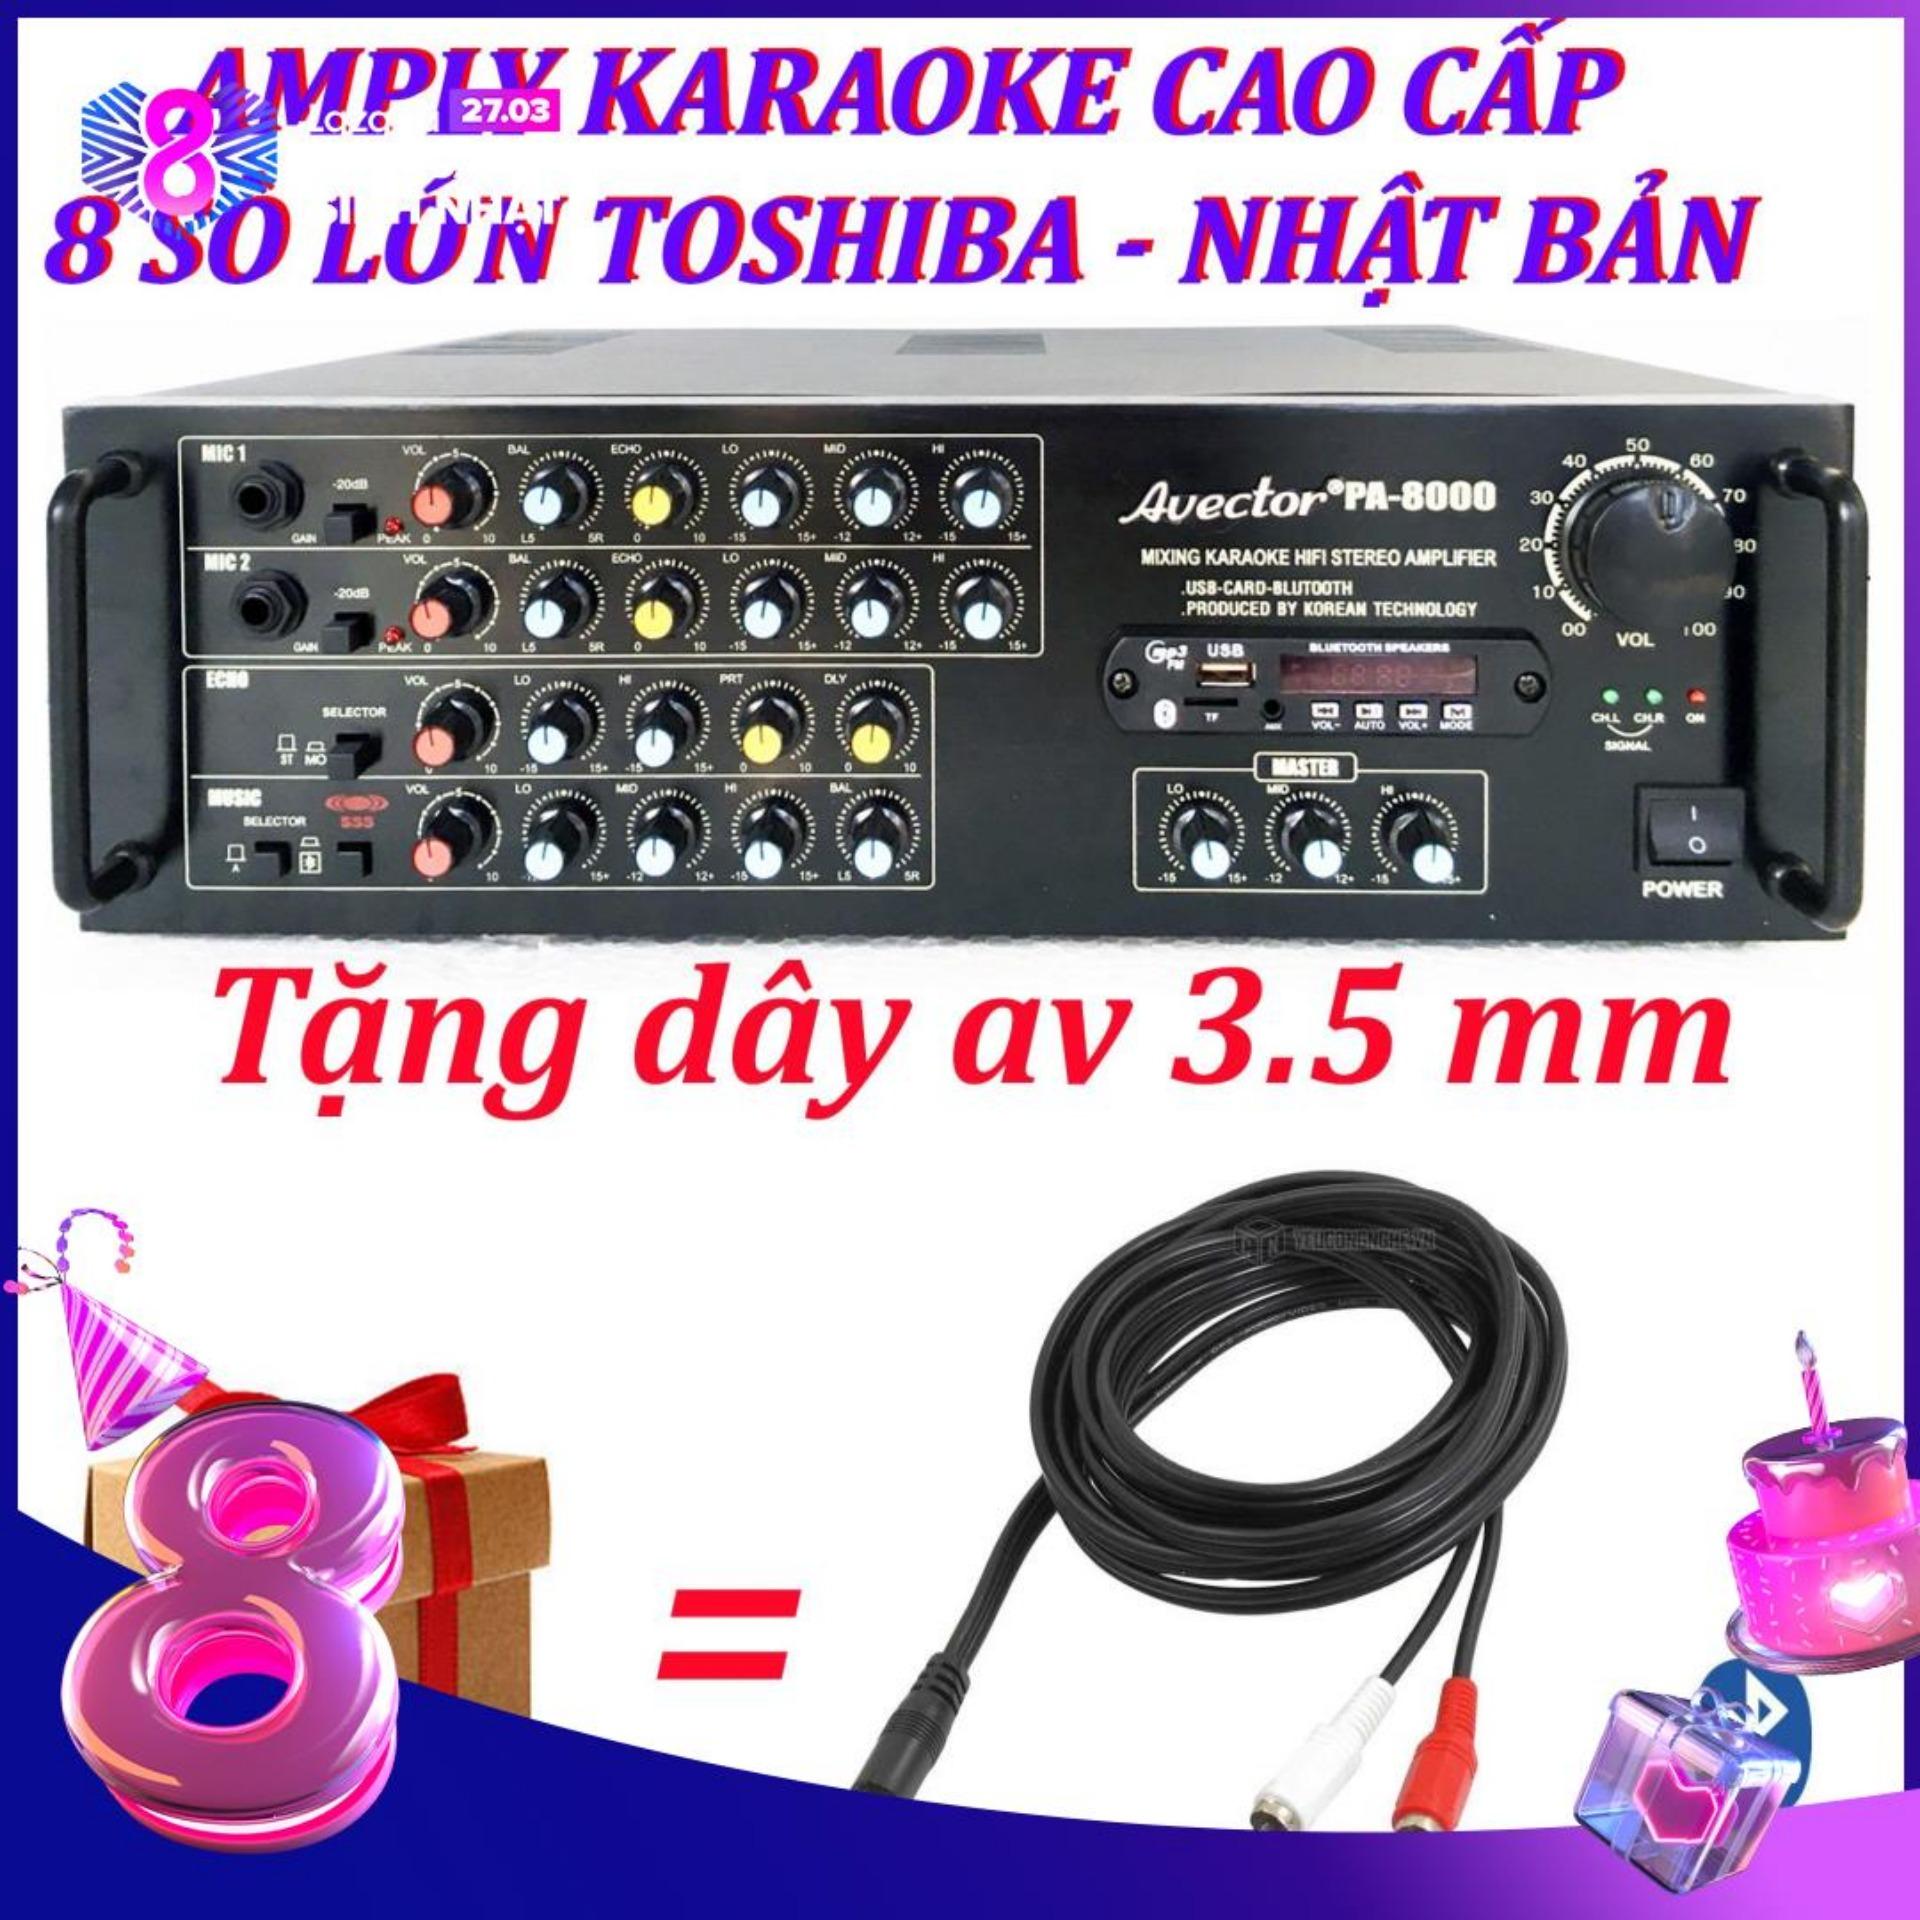 Amply karaoke ampli karaoke amply bluetooth nghe nhạc amply hat karaoke AVECTOR 8000 tặng dây av 3.5mm